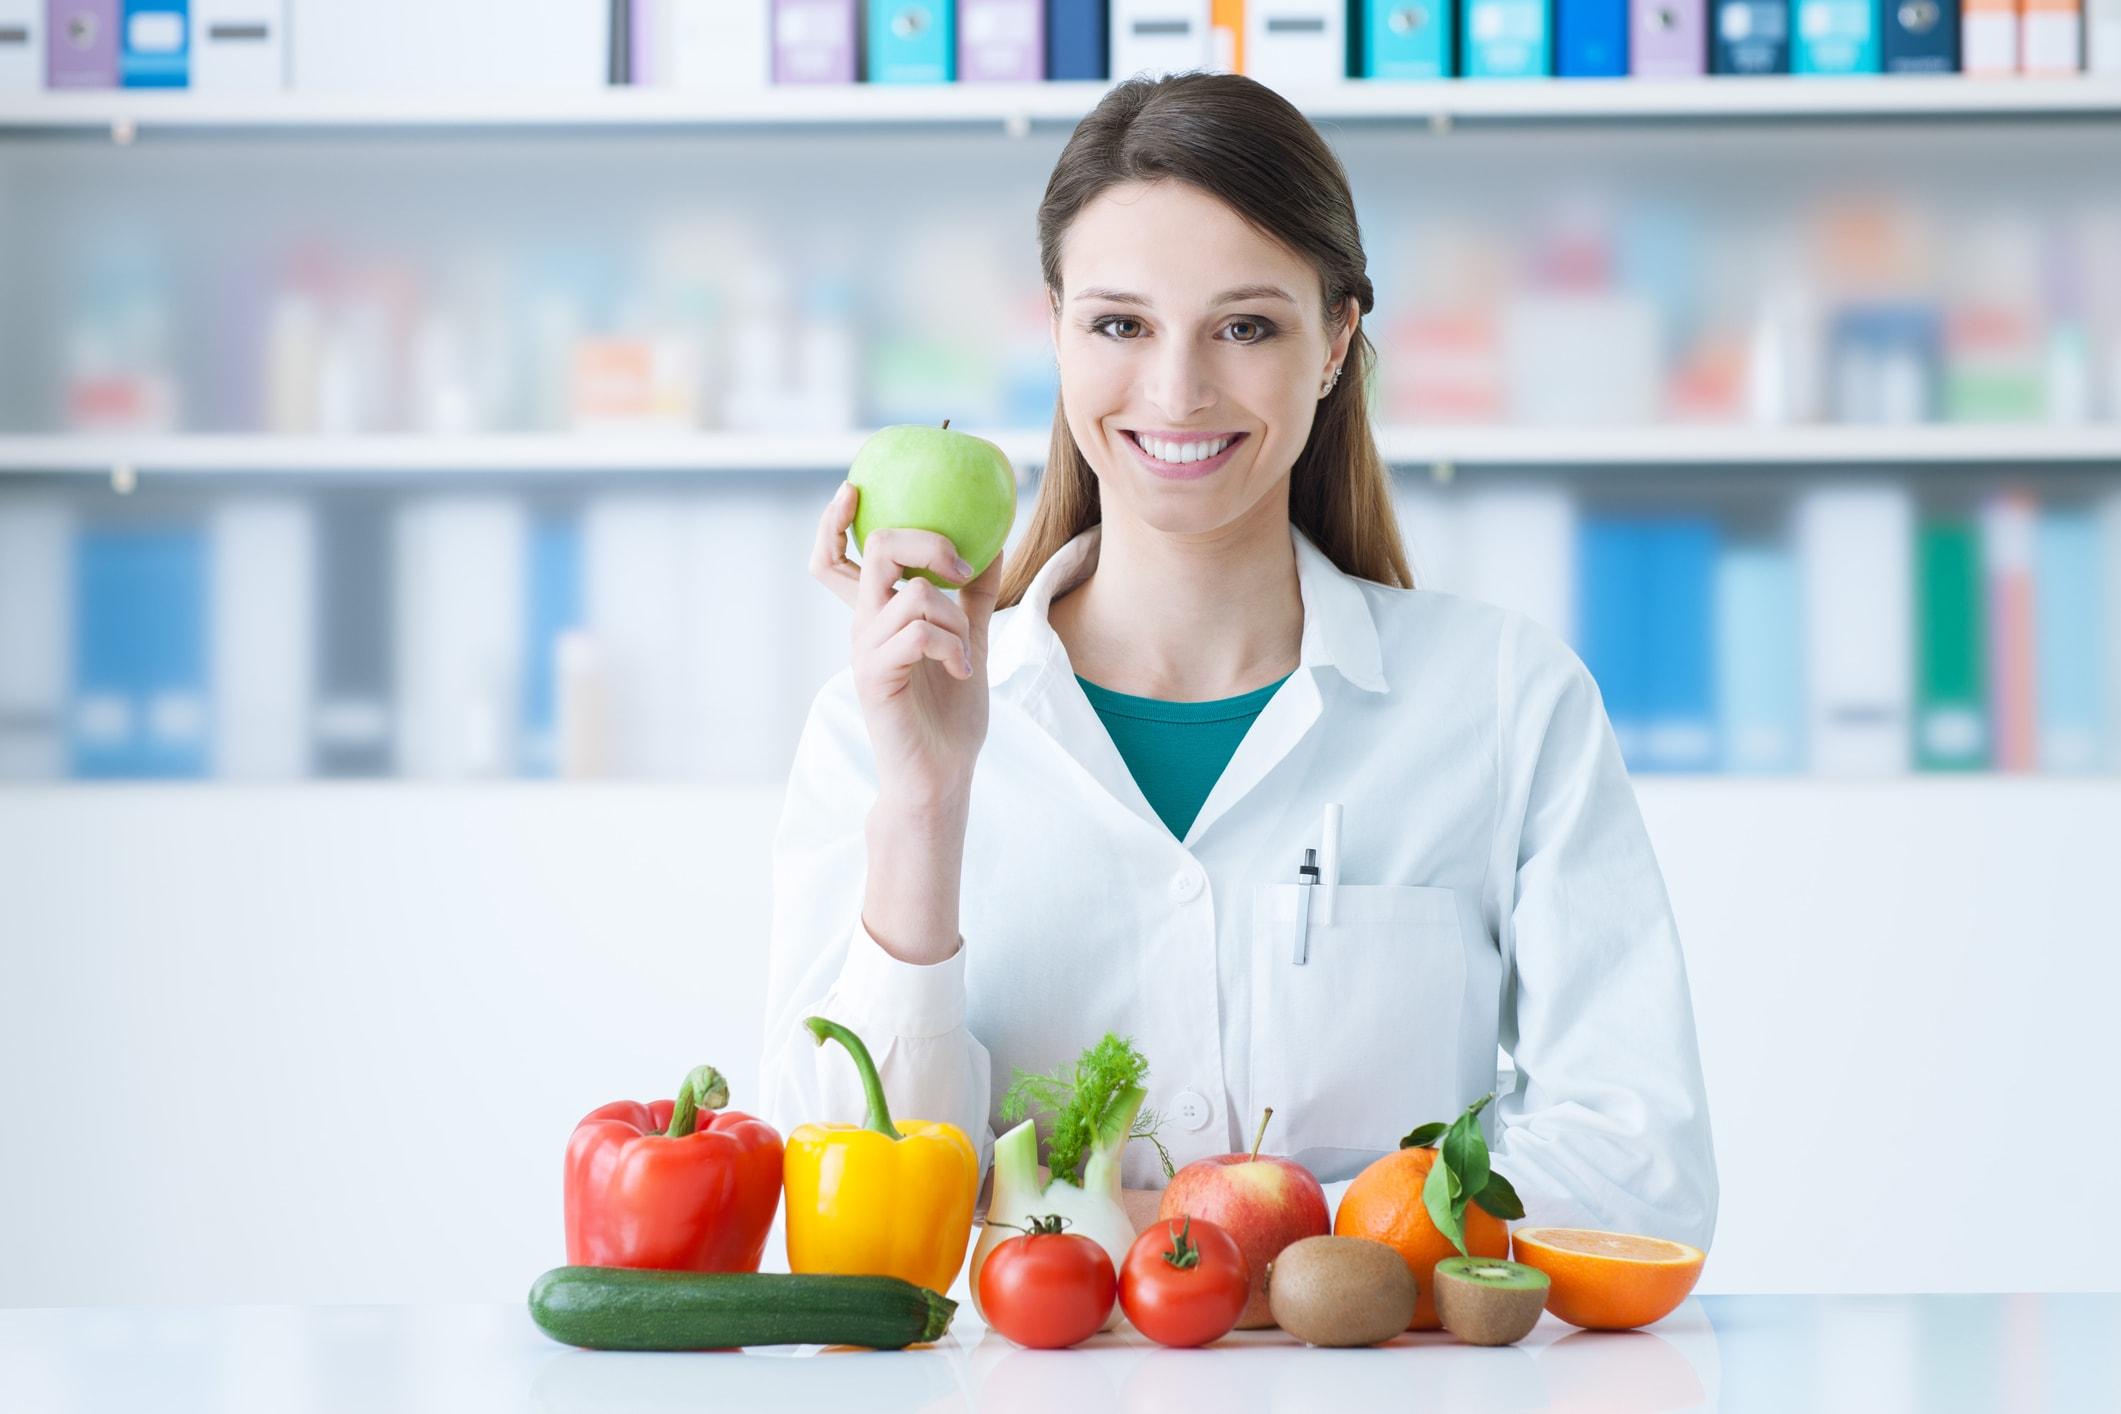 Apotheke, Obst, Gemüse